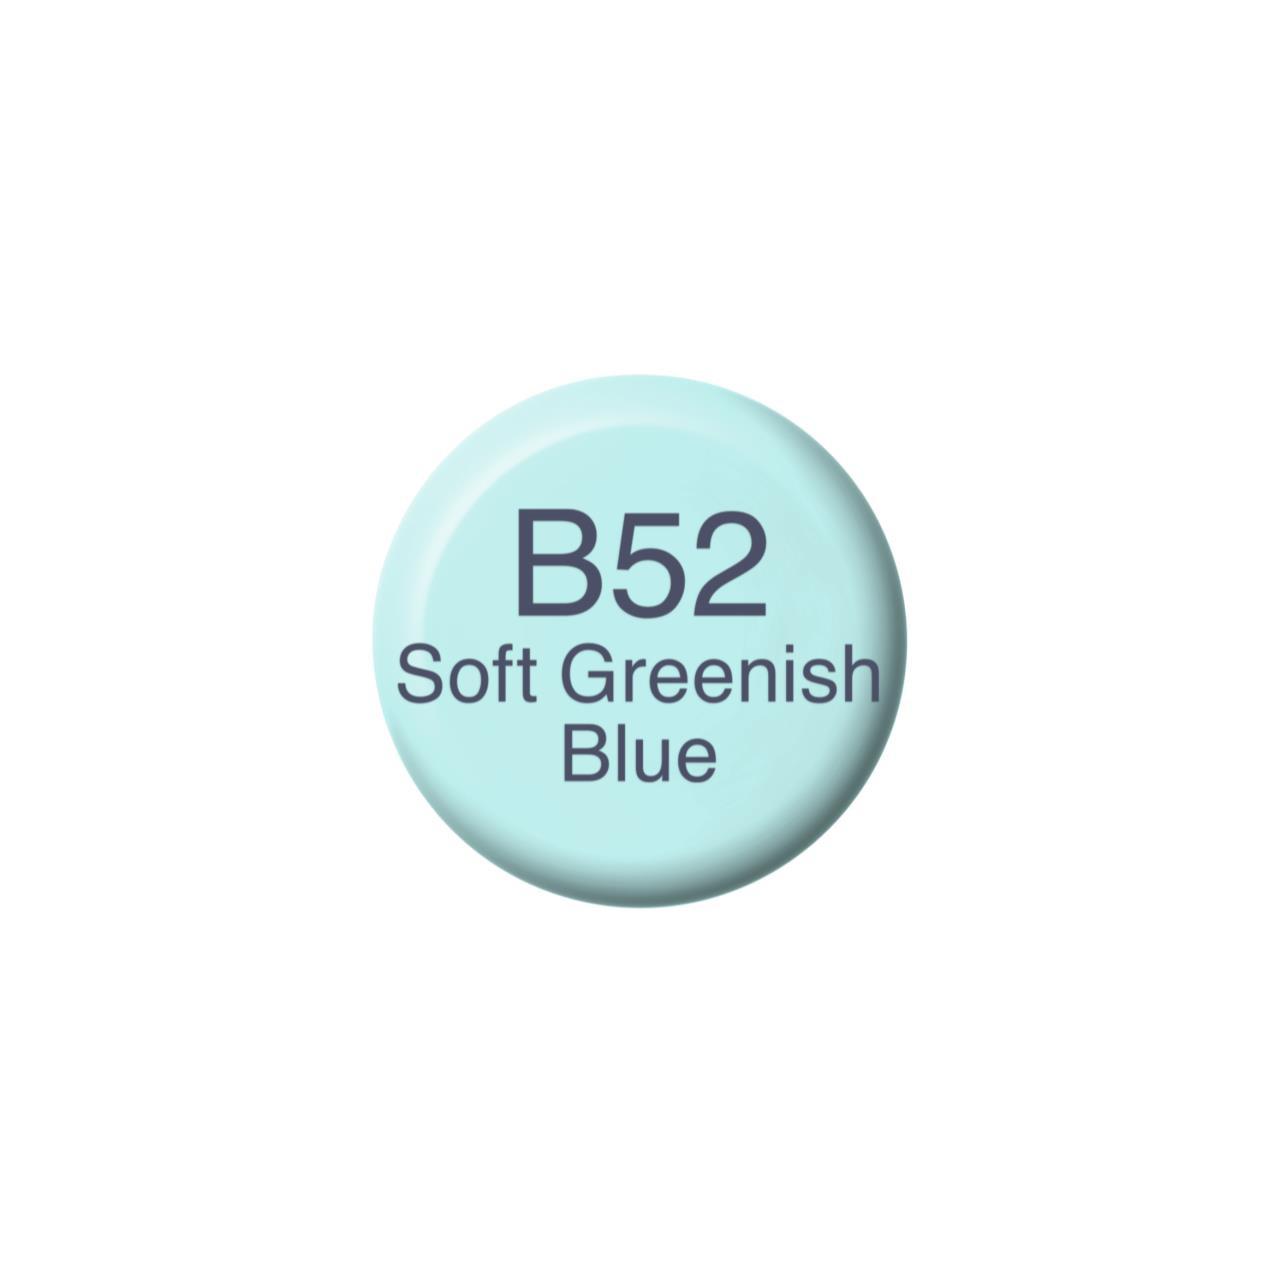 B52 Soft Greenish Blue, Copic Ink - 4511338056042